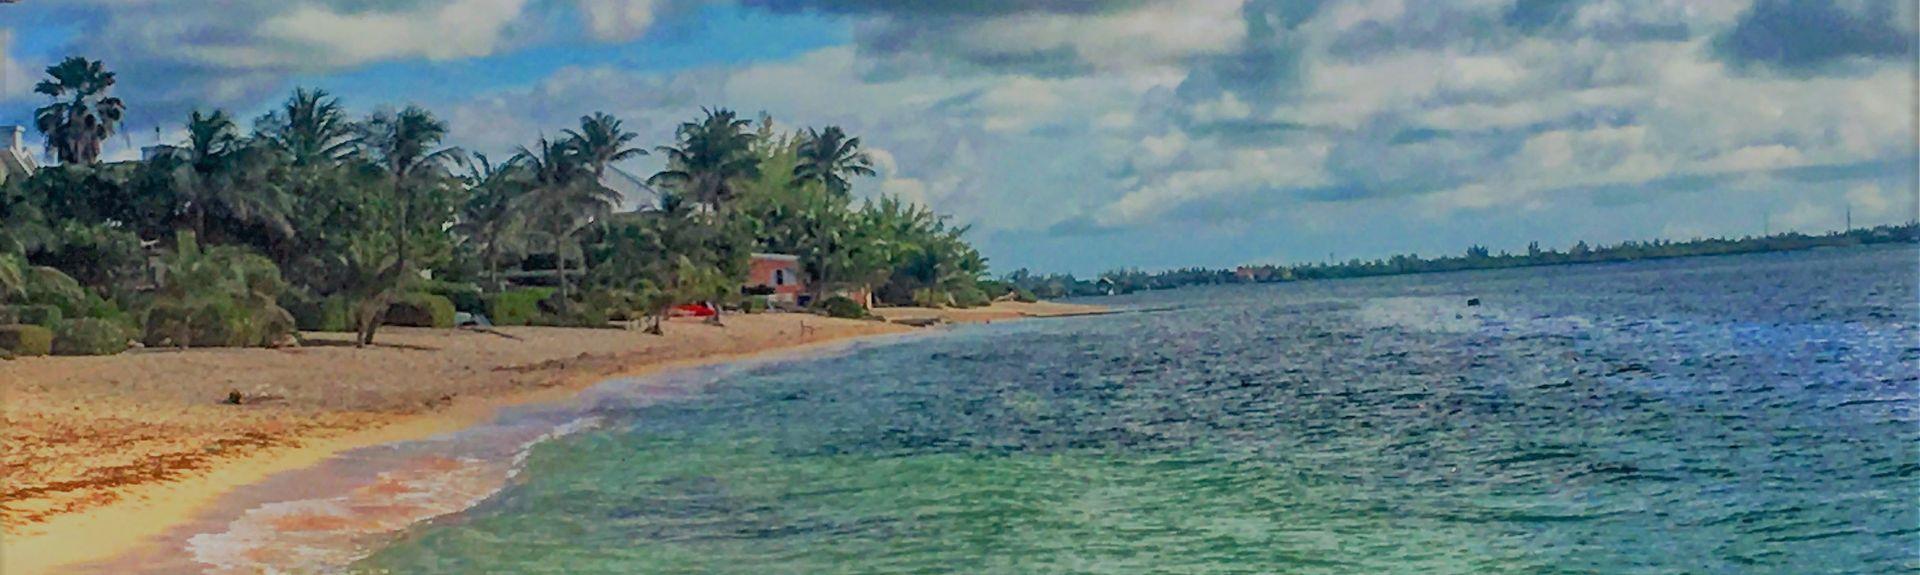 Boatswain's Beach, West Bay, Cayman Islands